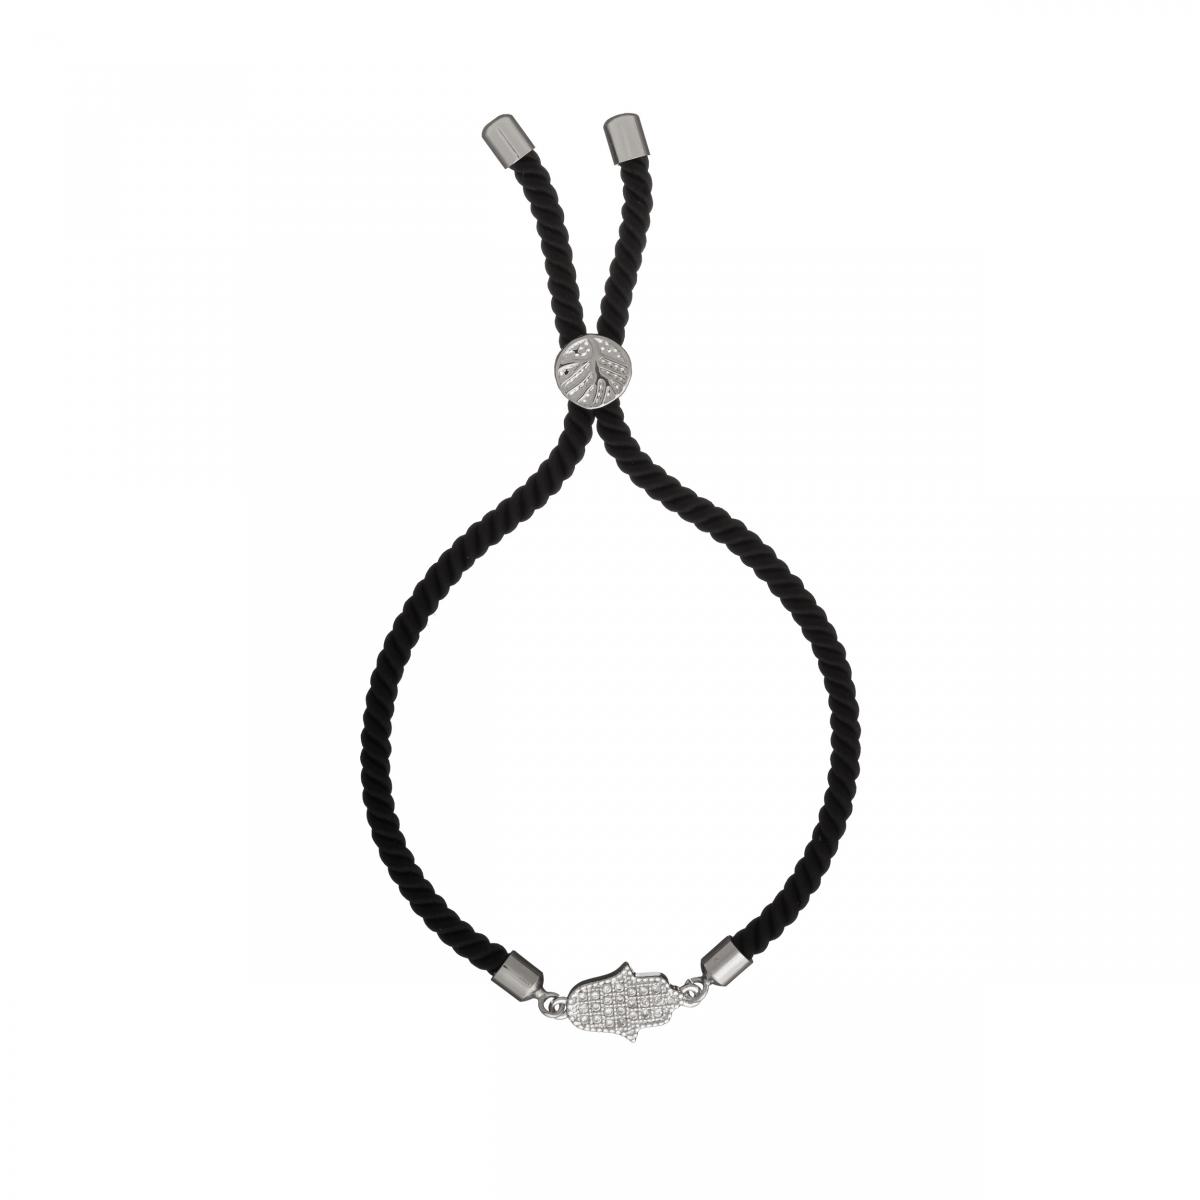 Náramok Macrame Black Hamsa Zircon Crystals Stainless Steel